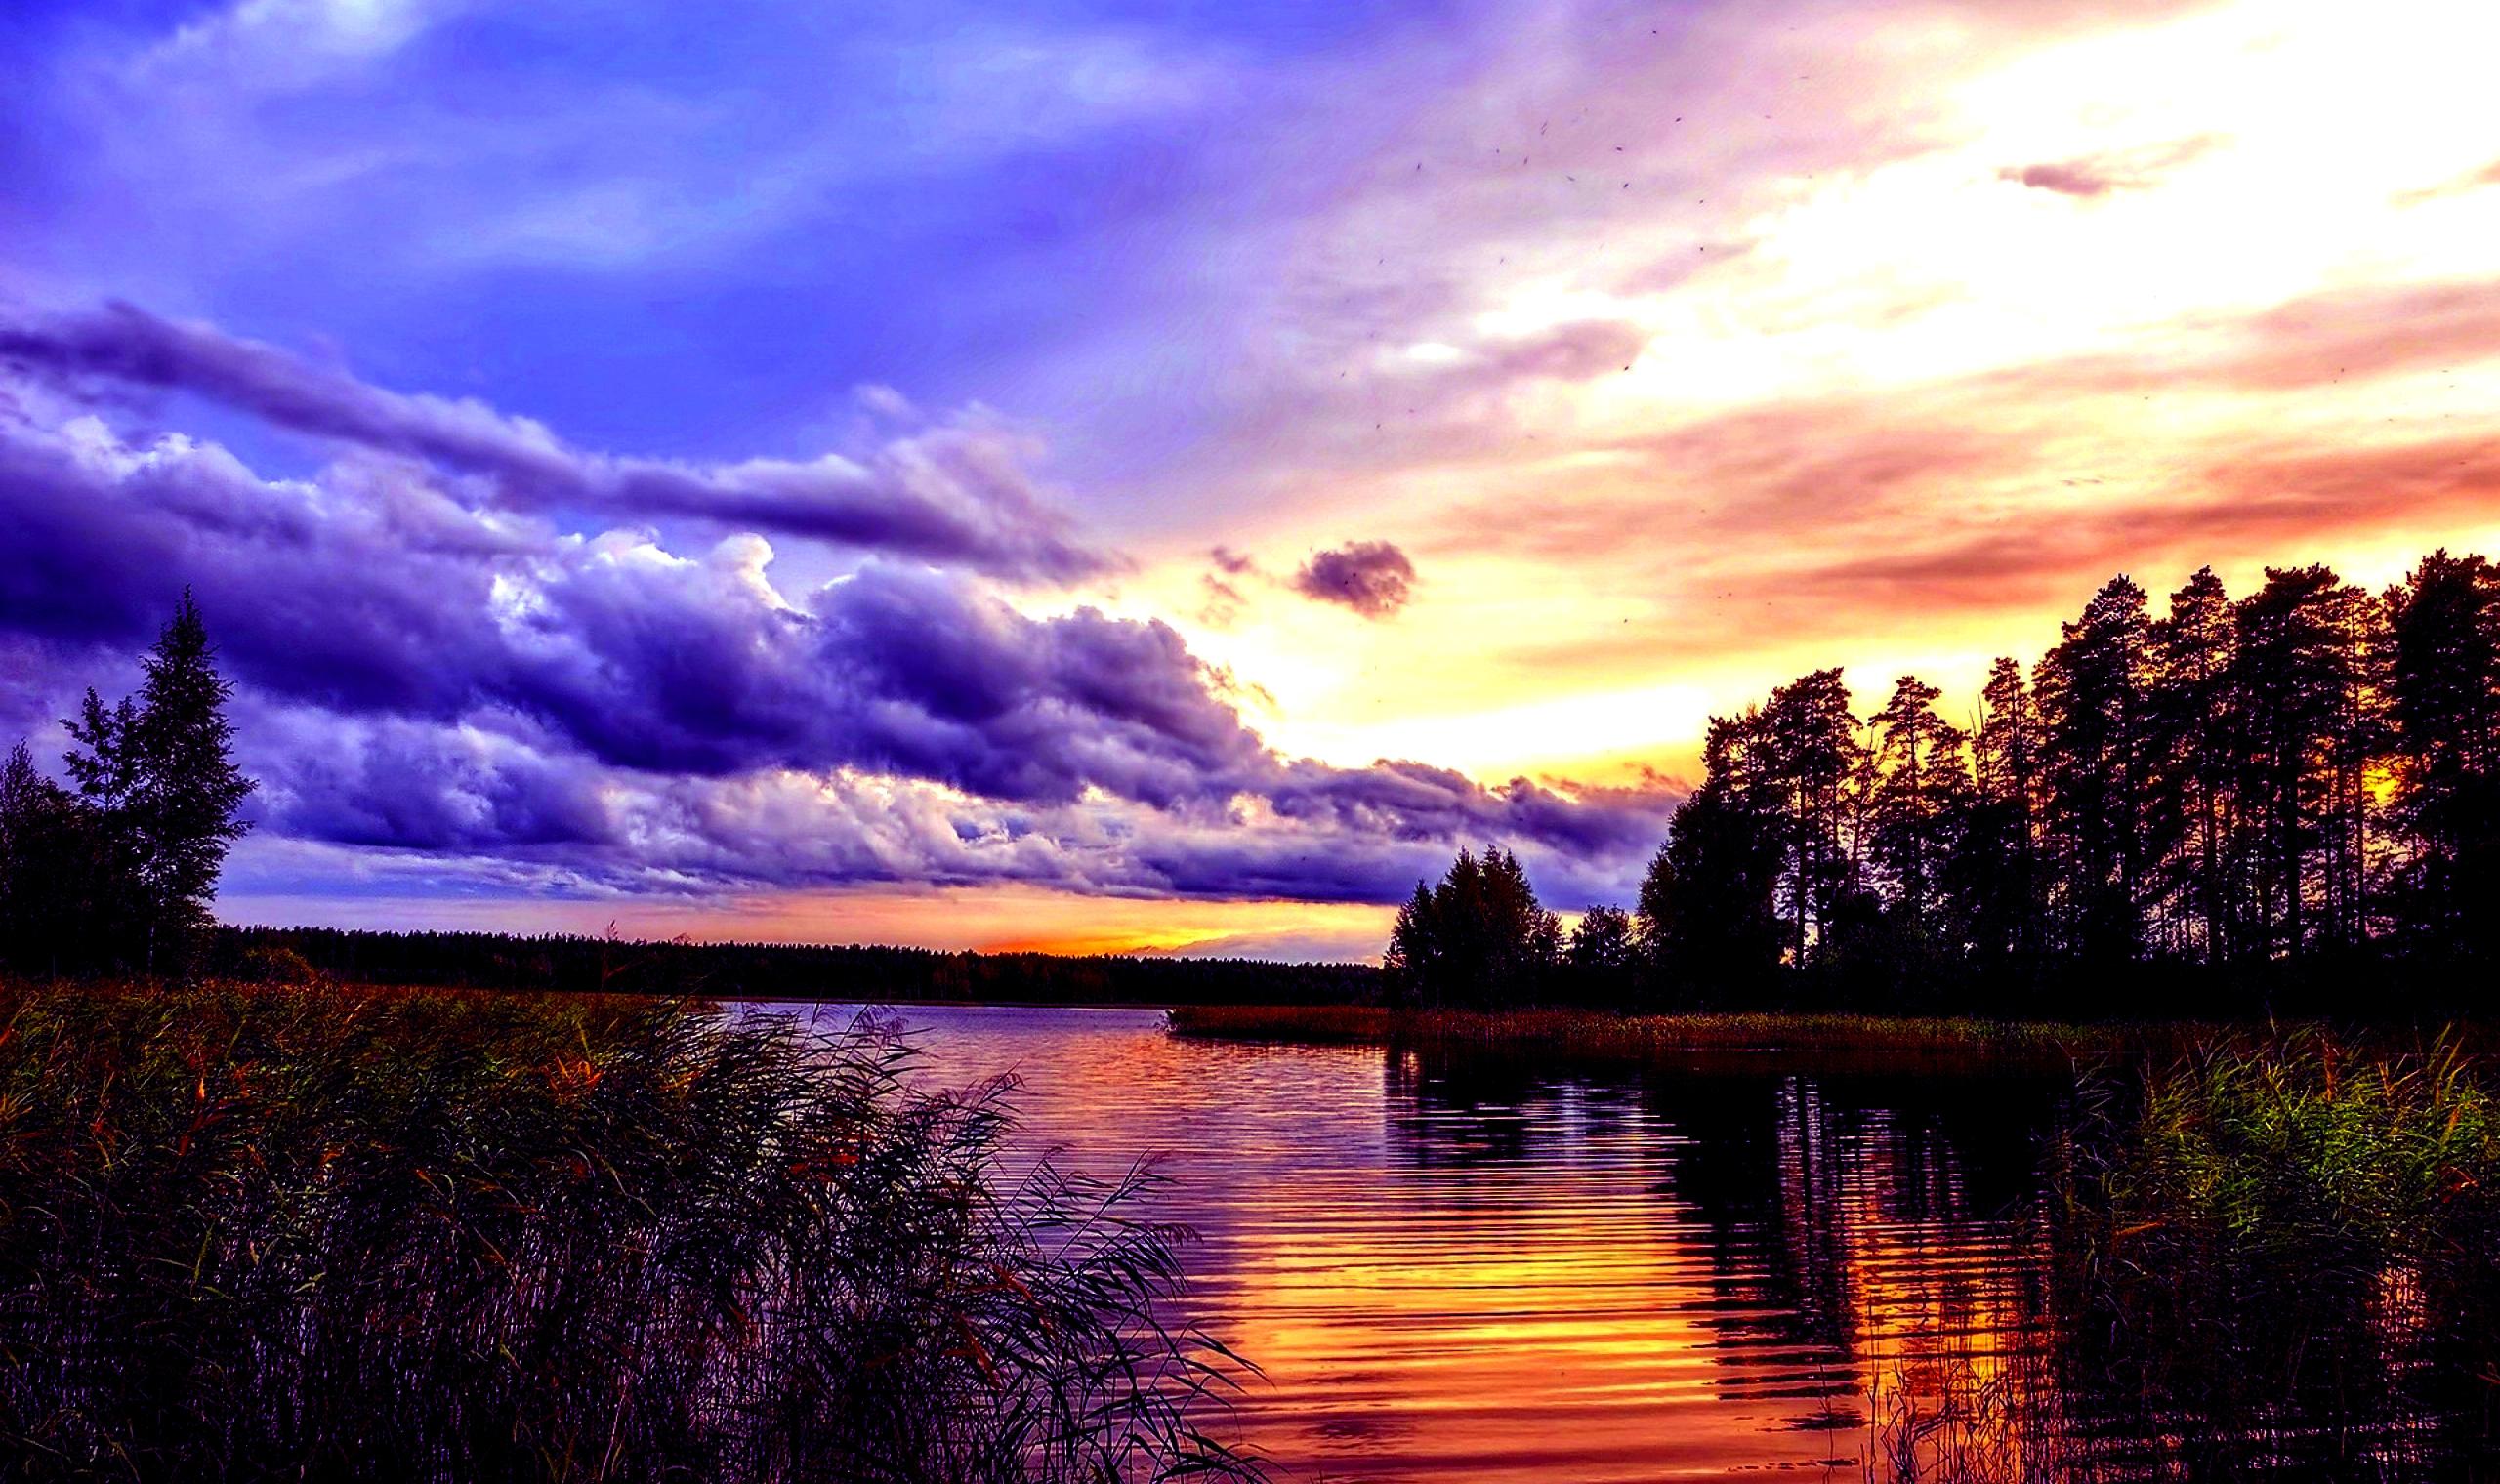 Cool nature desktop backgrounds wallpapersafari - Nature background images ...